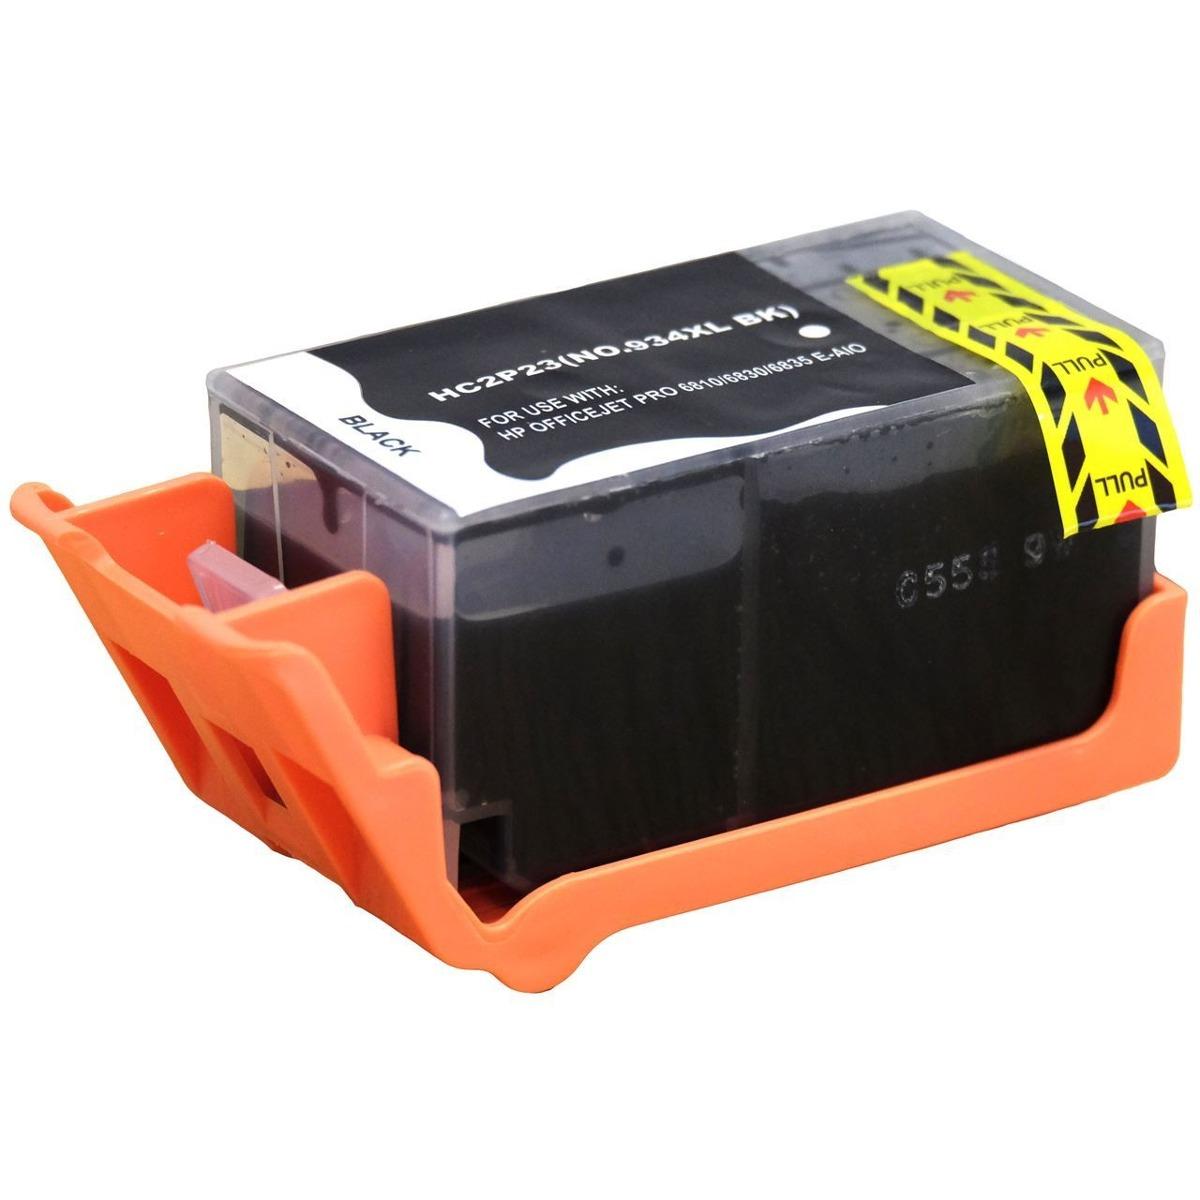 Cartucho de Tinta Compatível HP 934xl (C2P23) Preto 58ml